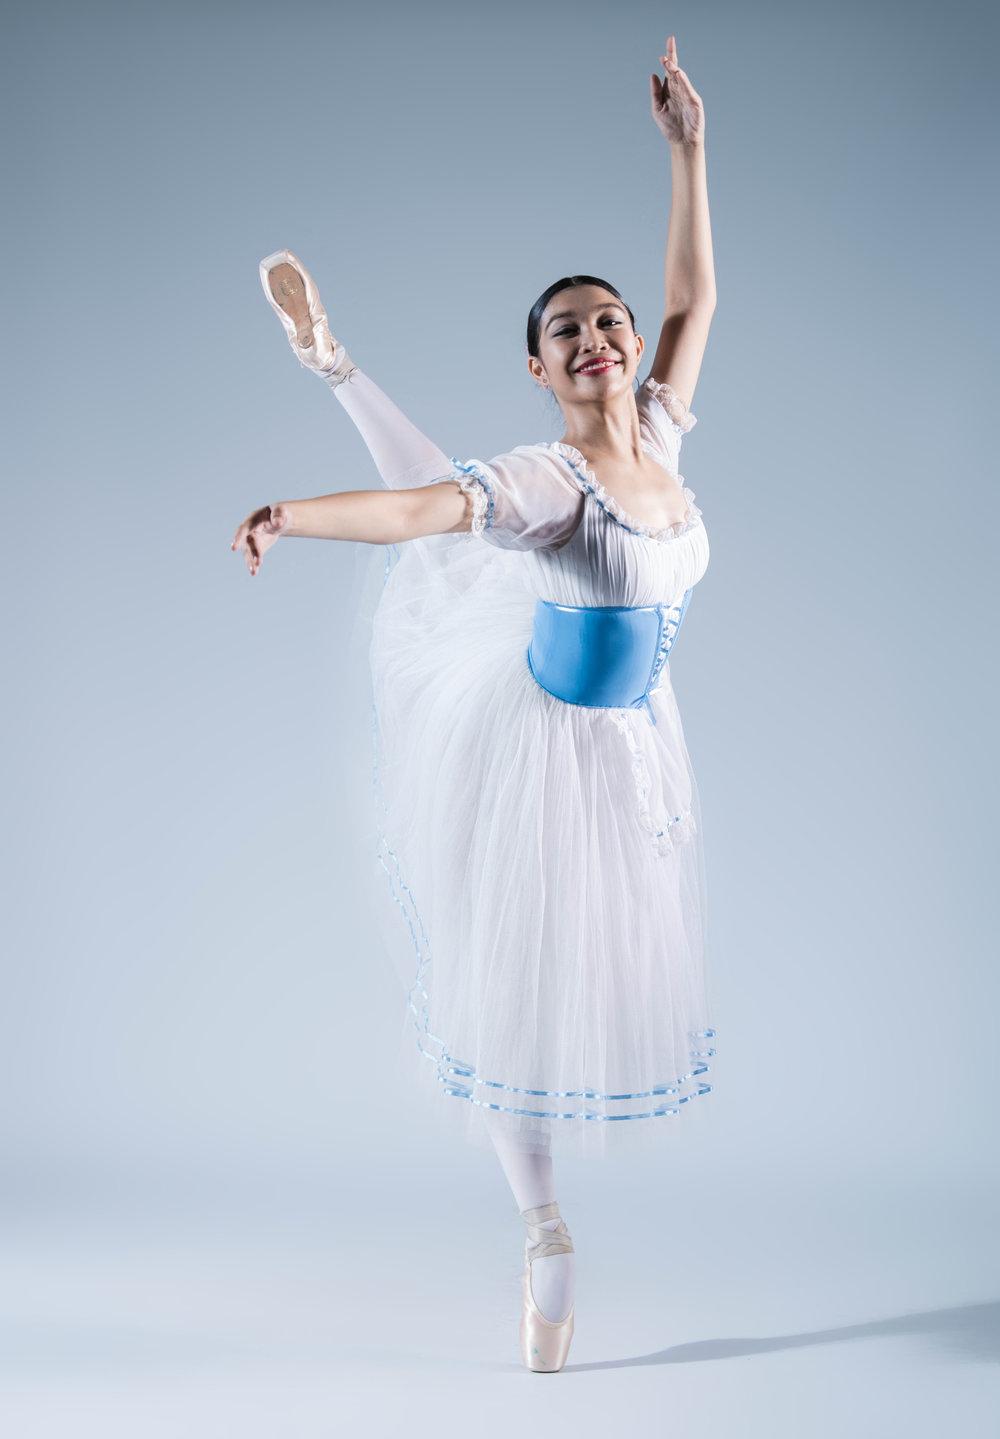 Ballet Manila trainee Monique Valera will compete in Junior B. Photo by MarBi Photography